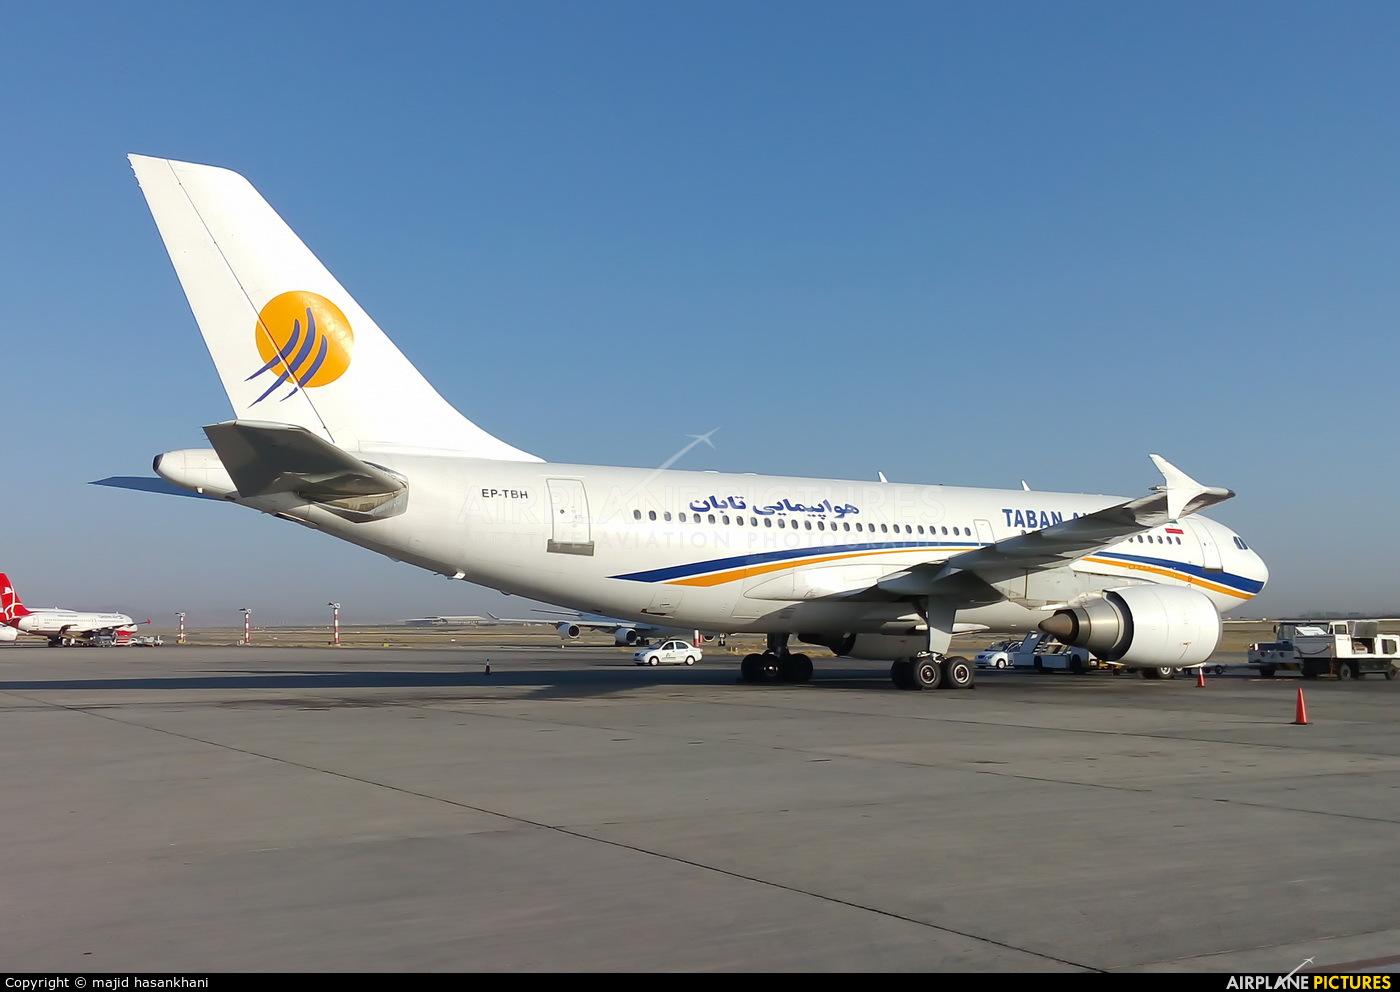 TABAN Airlines приступает к полетам по направлению Исфахан-Тбилиси. Copyright majid hasankhani